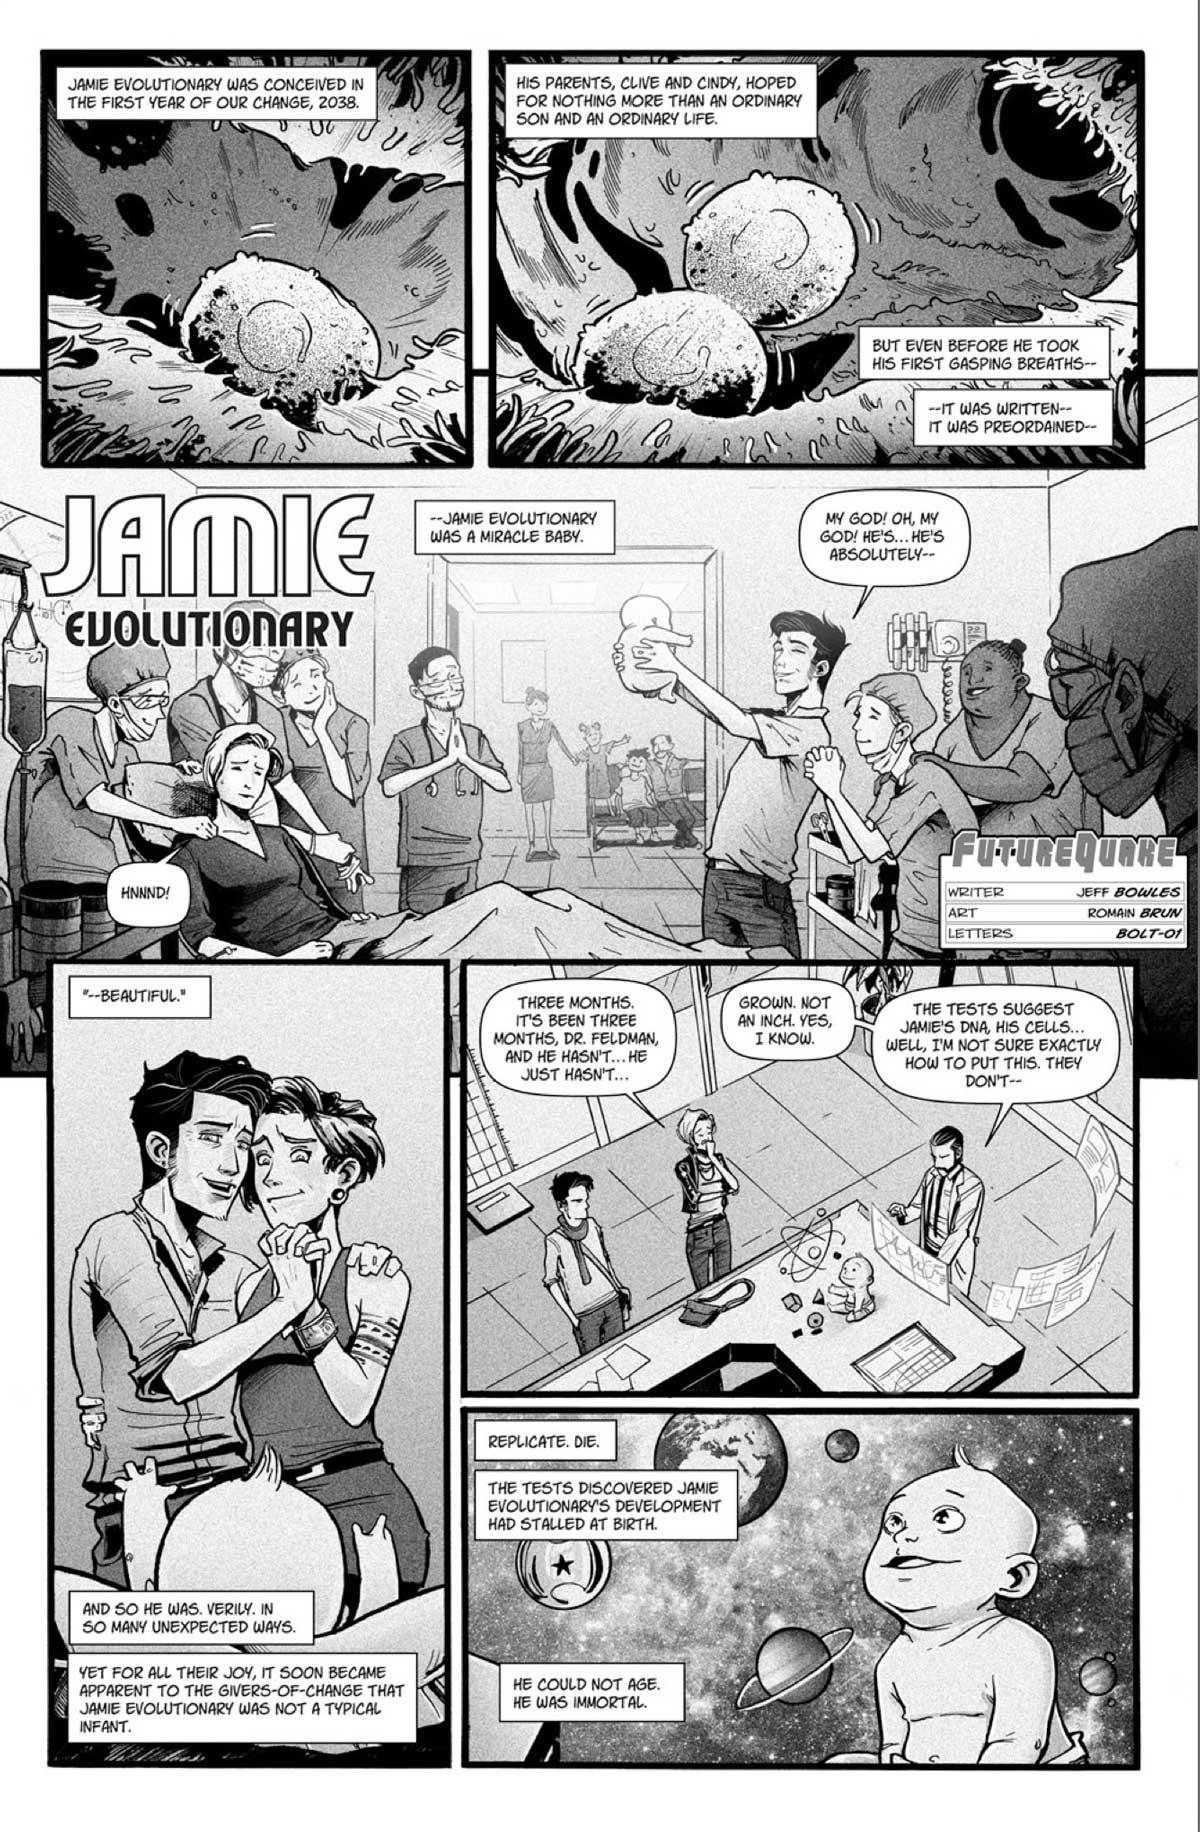 Futurequake Sumer 2017 - Jamie Evolutionary